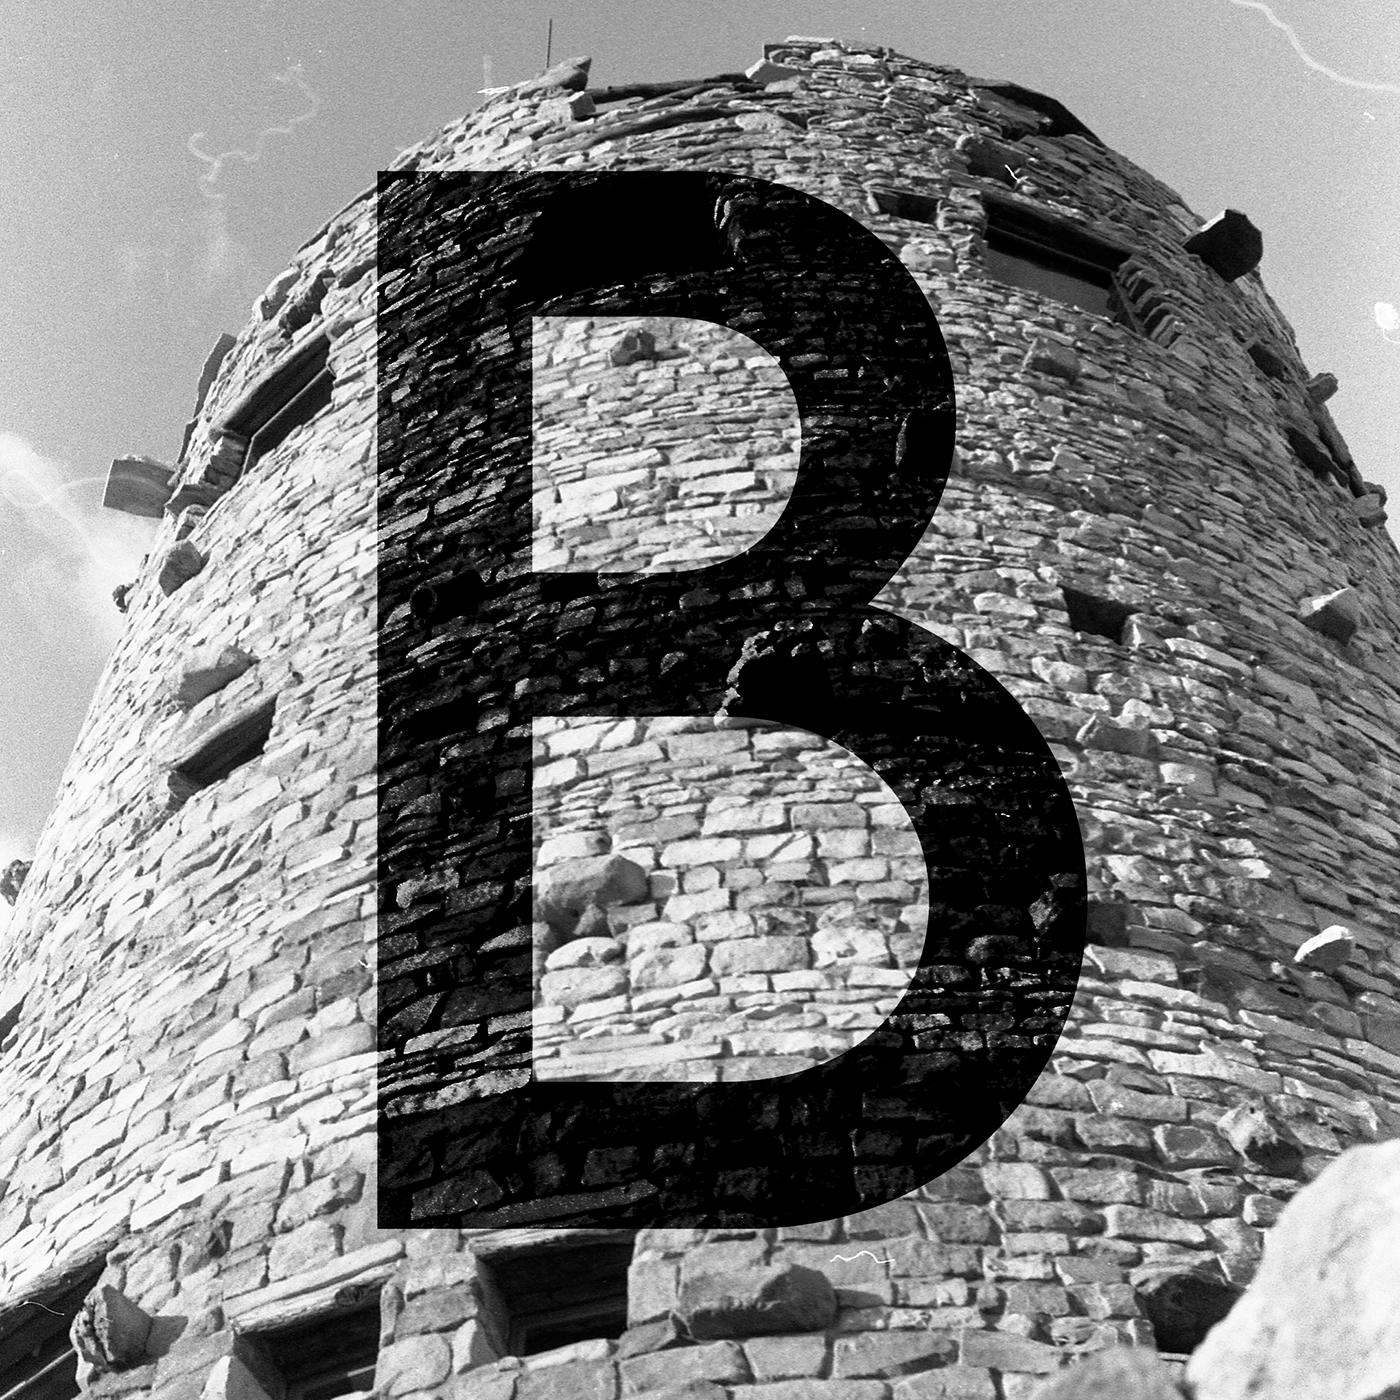 Capital B Photographic Illuminated Capital. Film photograph with digital manipulation.